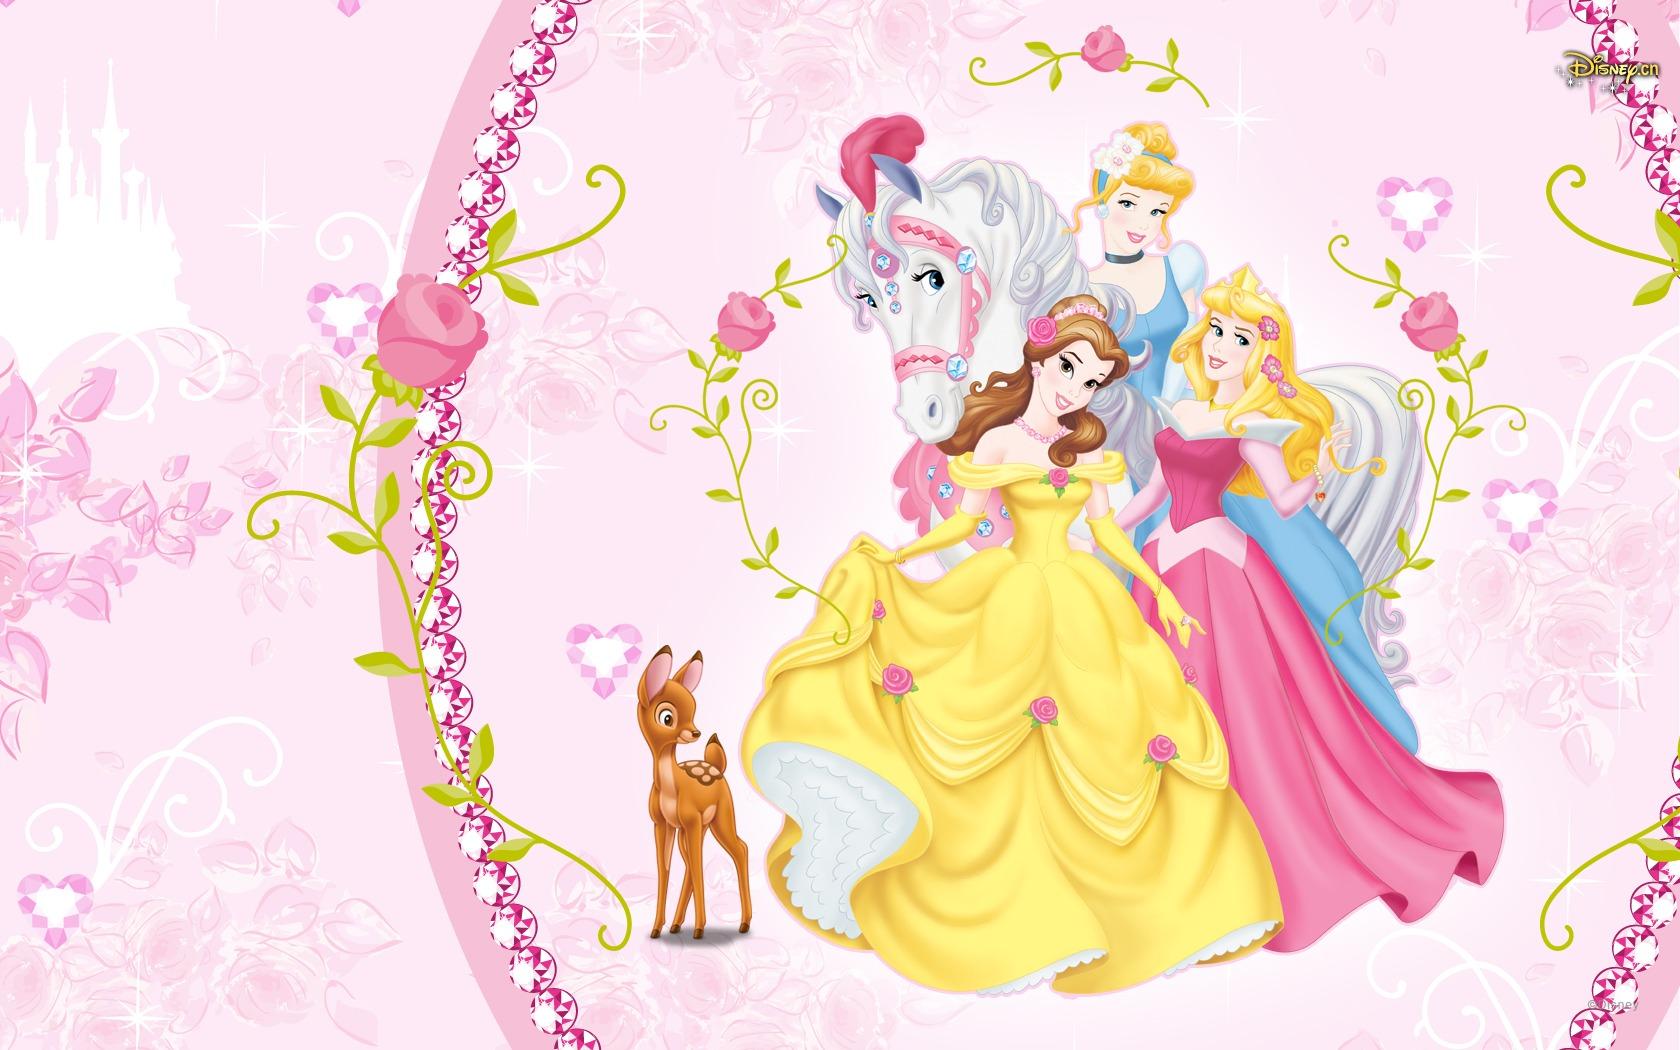 Disney Princess   Disney Princess Wallpaper 33693783 1680x1050